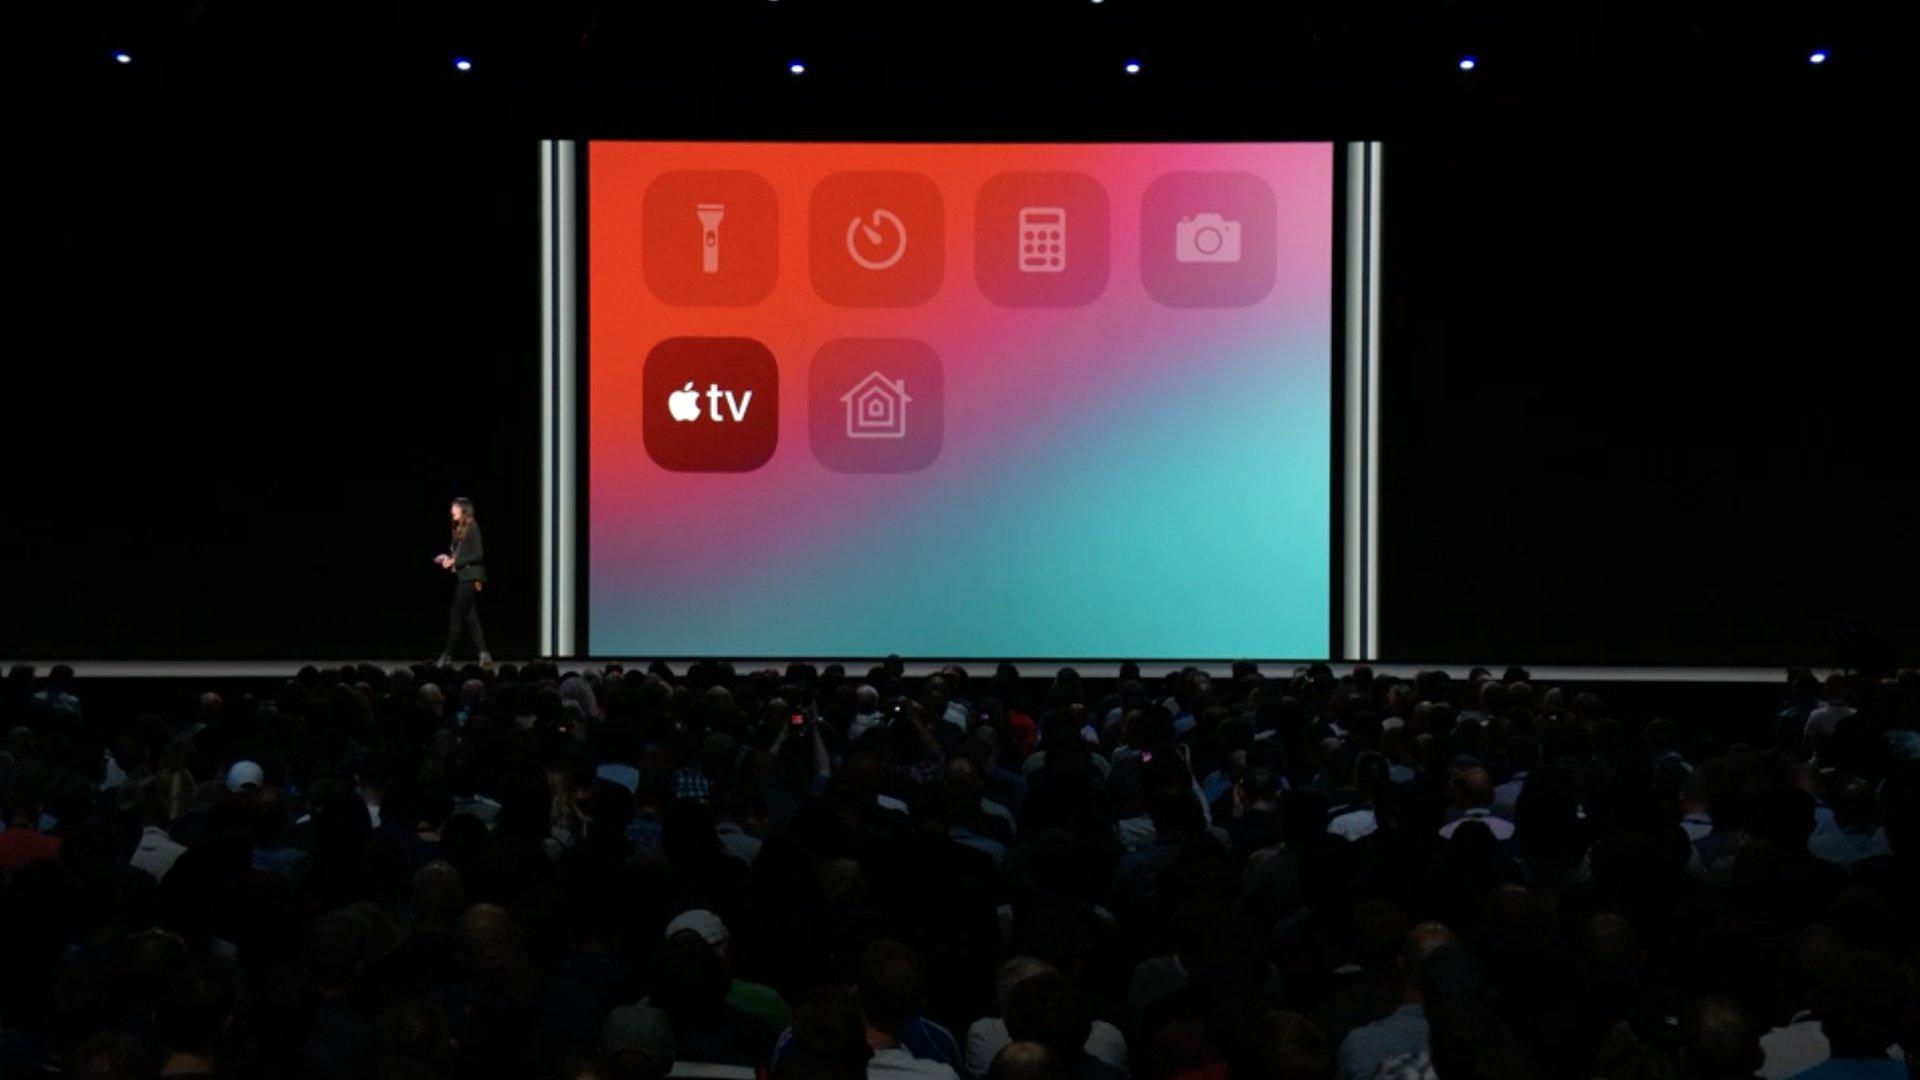 Apple tvOS 12